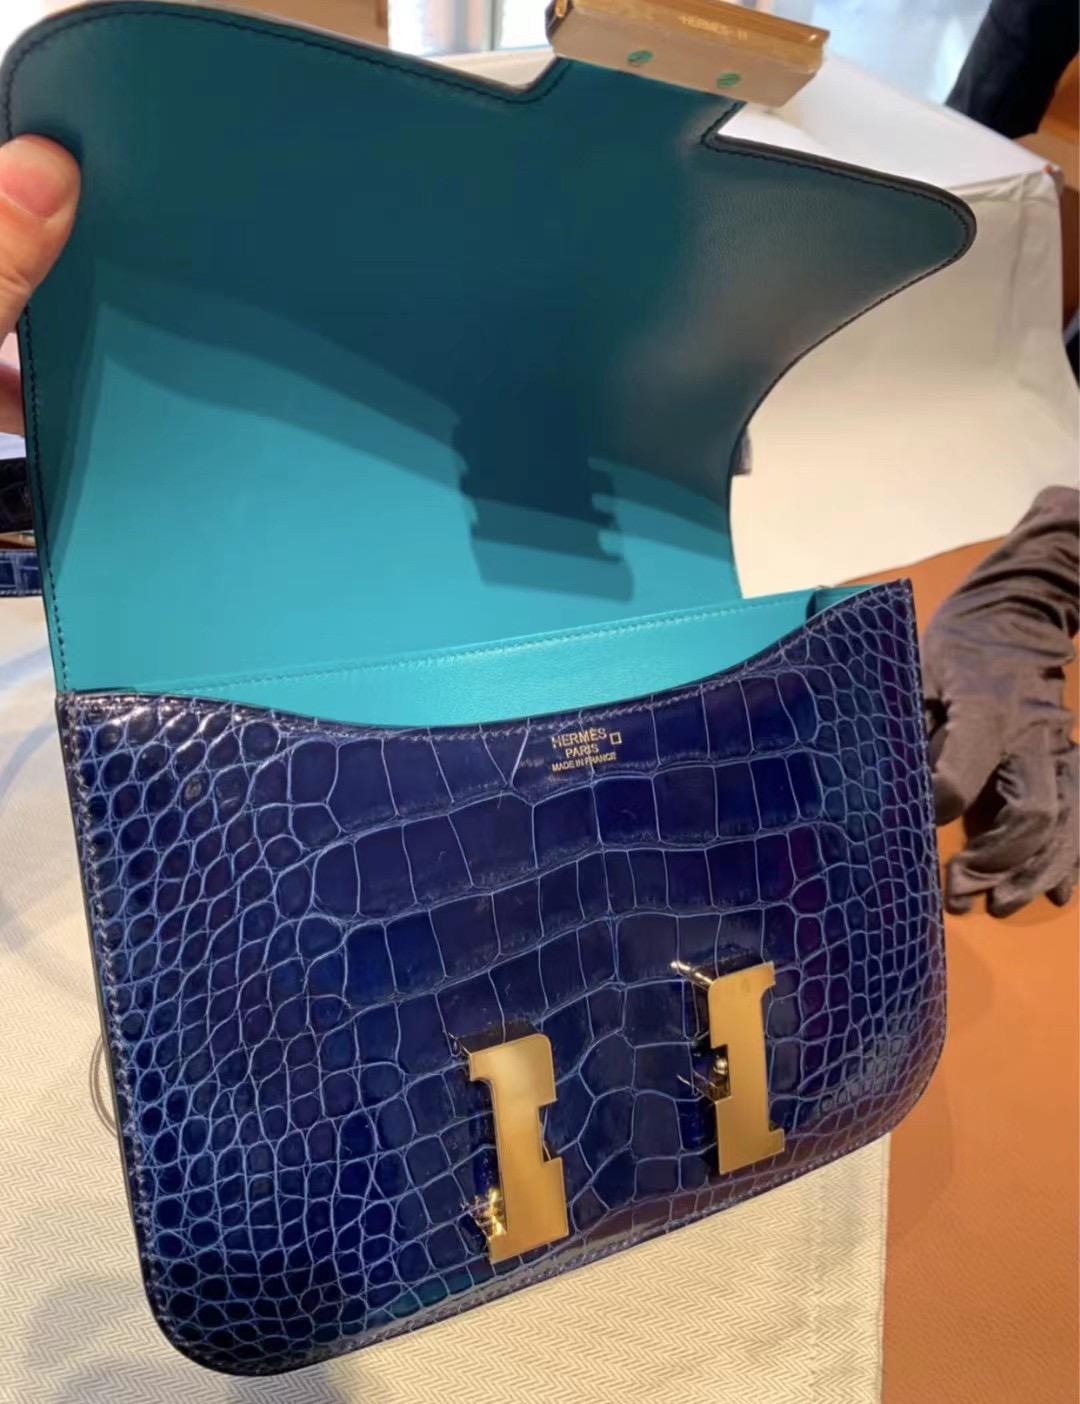 Hermes Constance 19 美洲鱷魚 73 Blue Sapphire 寶石藍 7F Blue Paon 孔雀藍